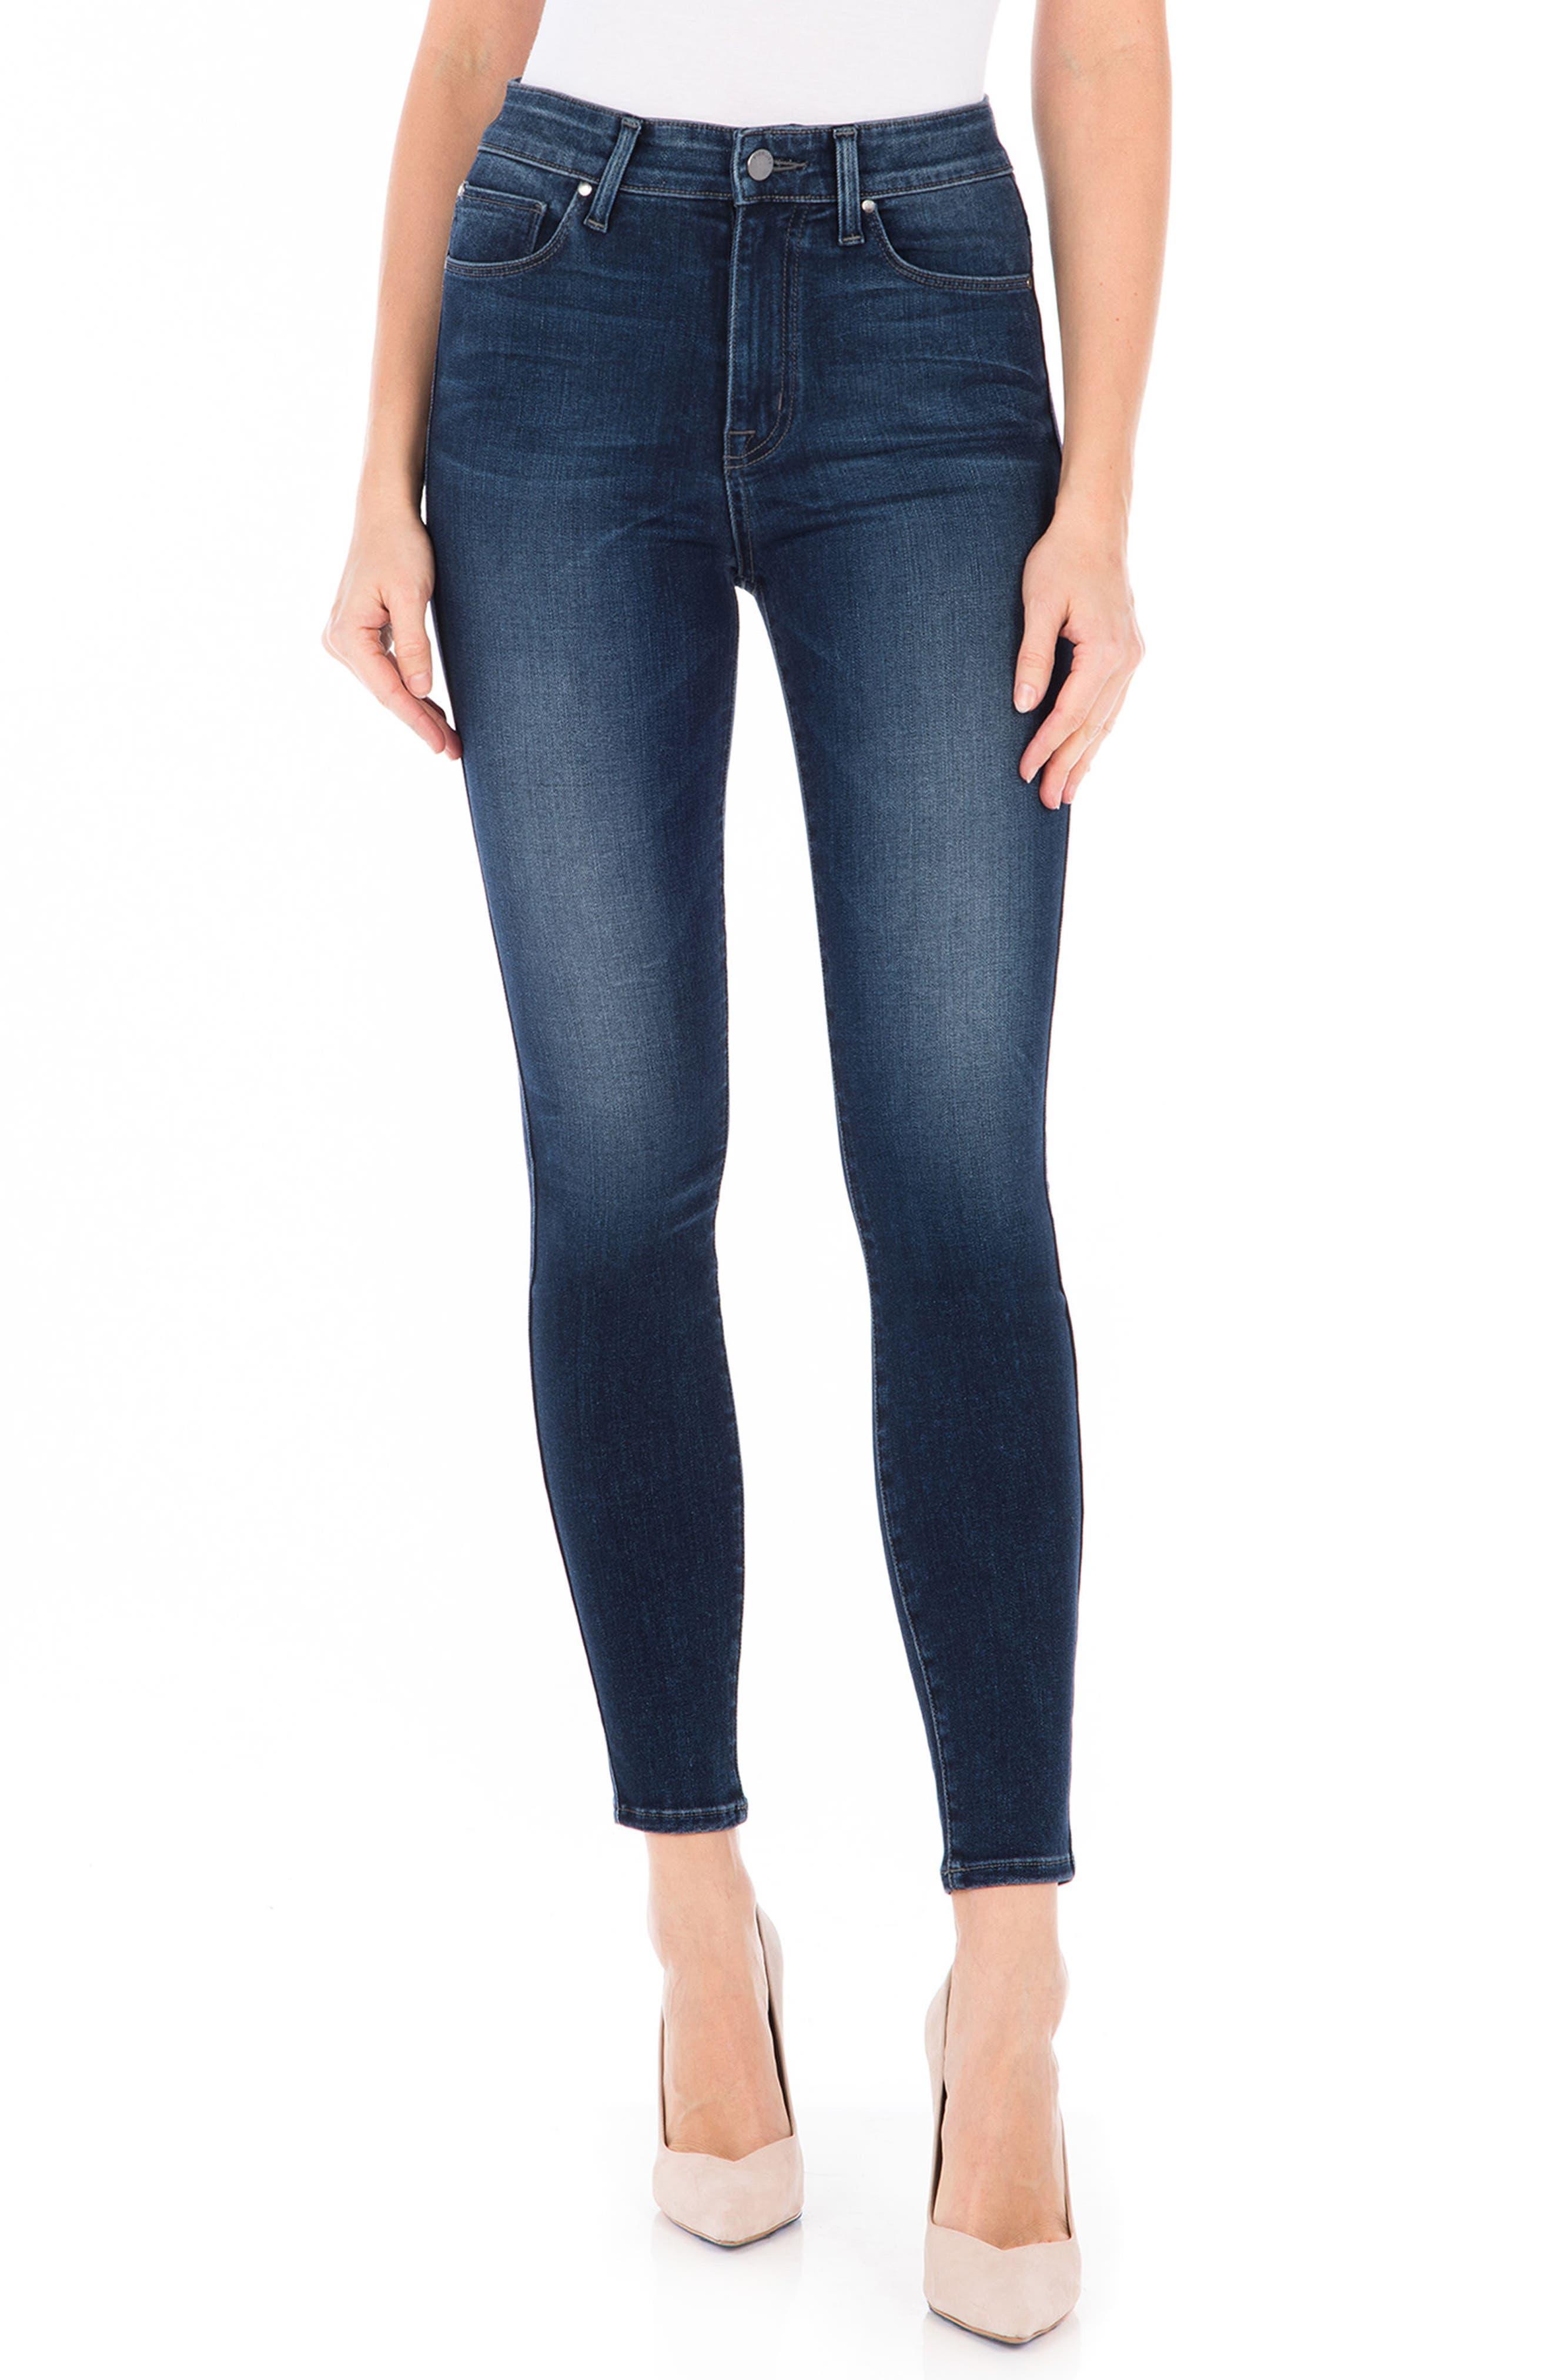 Fidelity Denim Luna High Waist Skinny Jeans (Blue Suede)